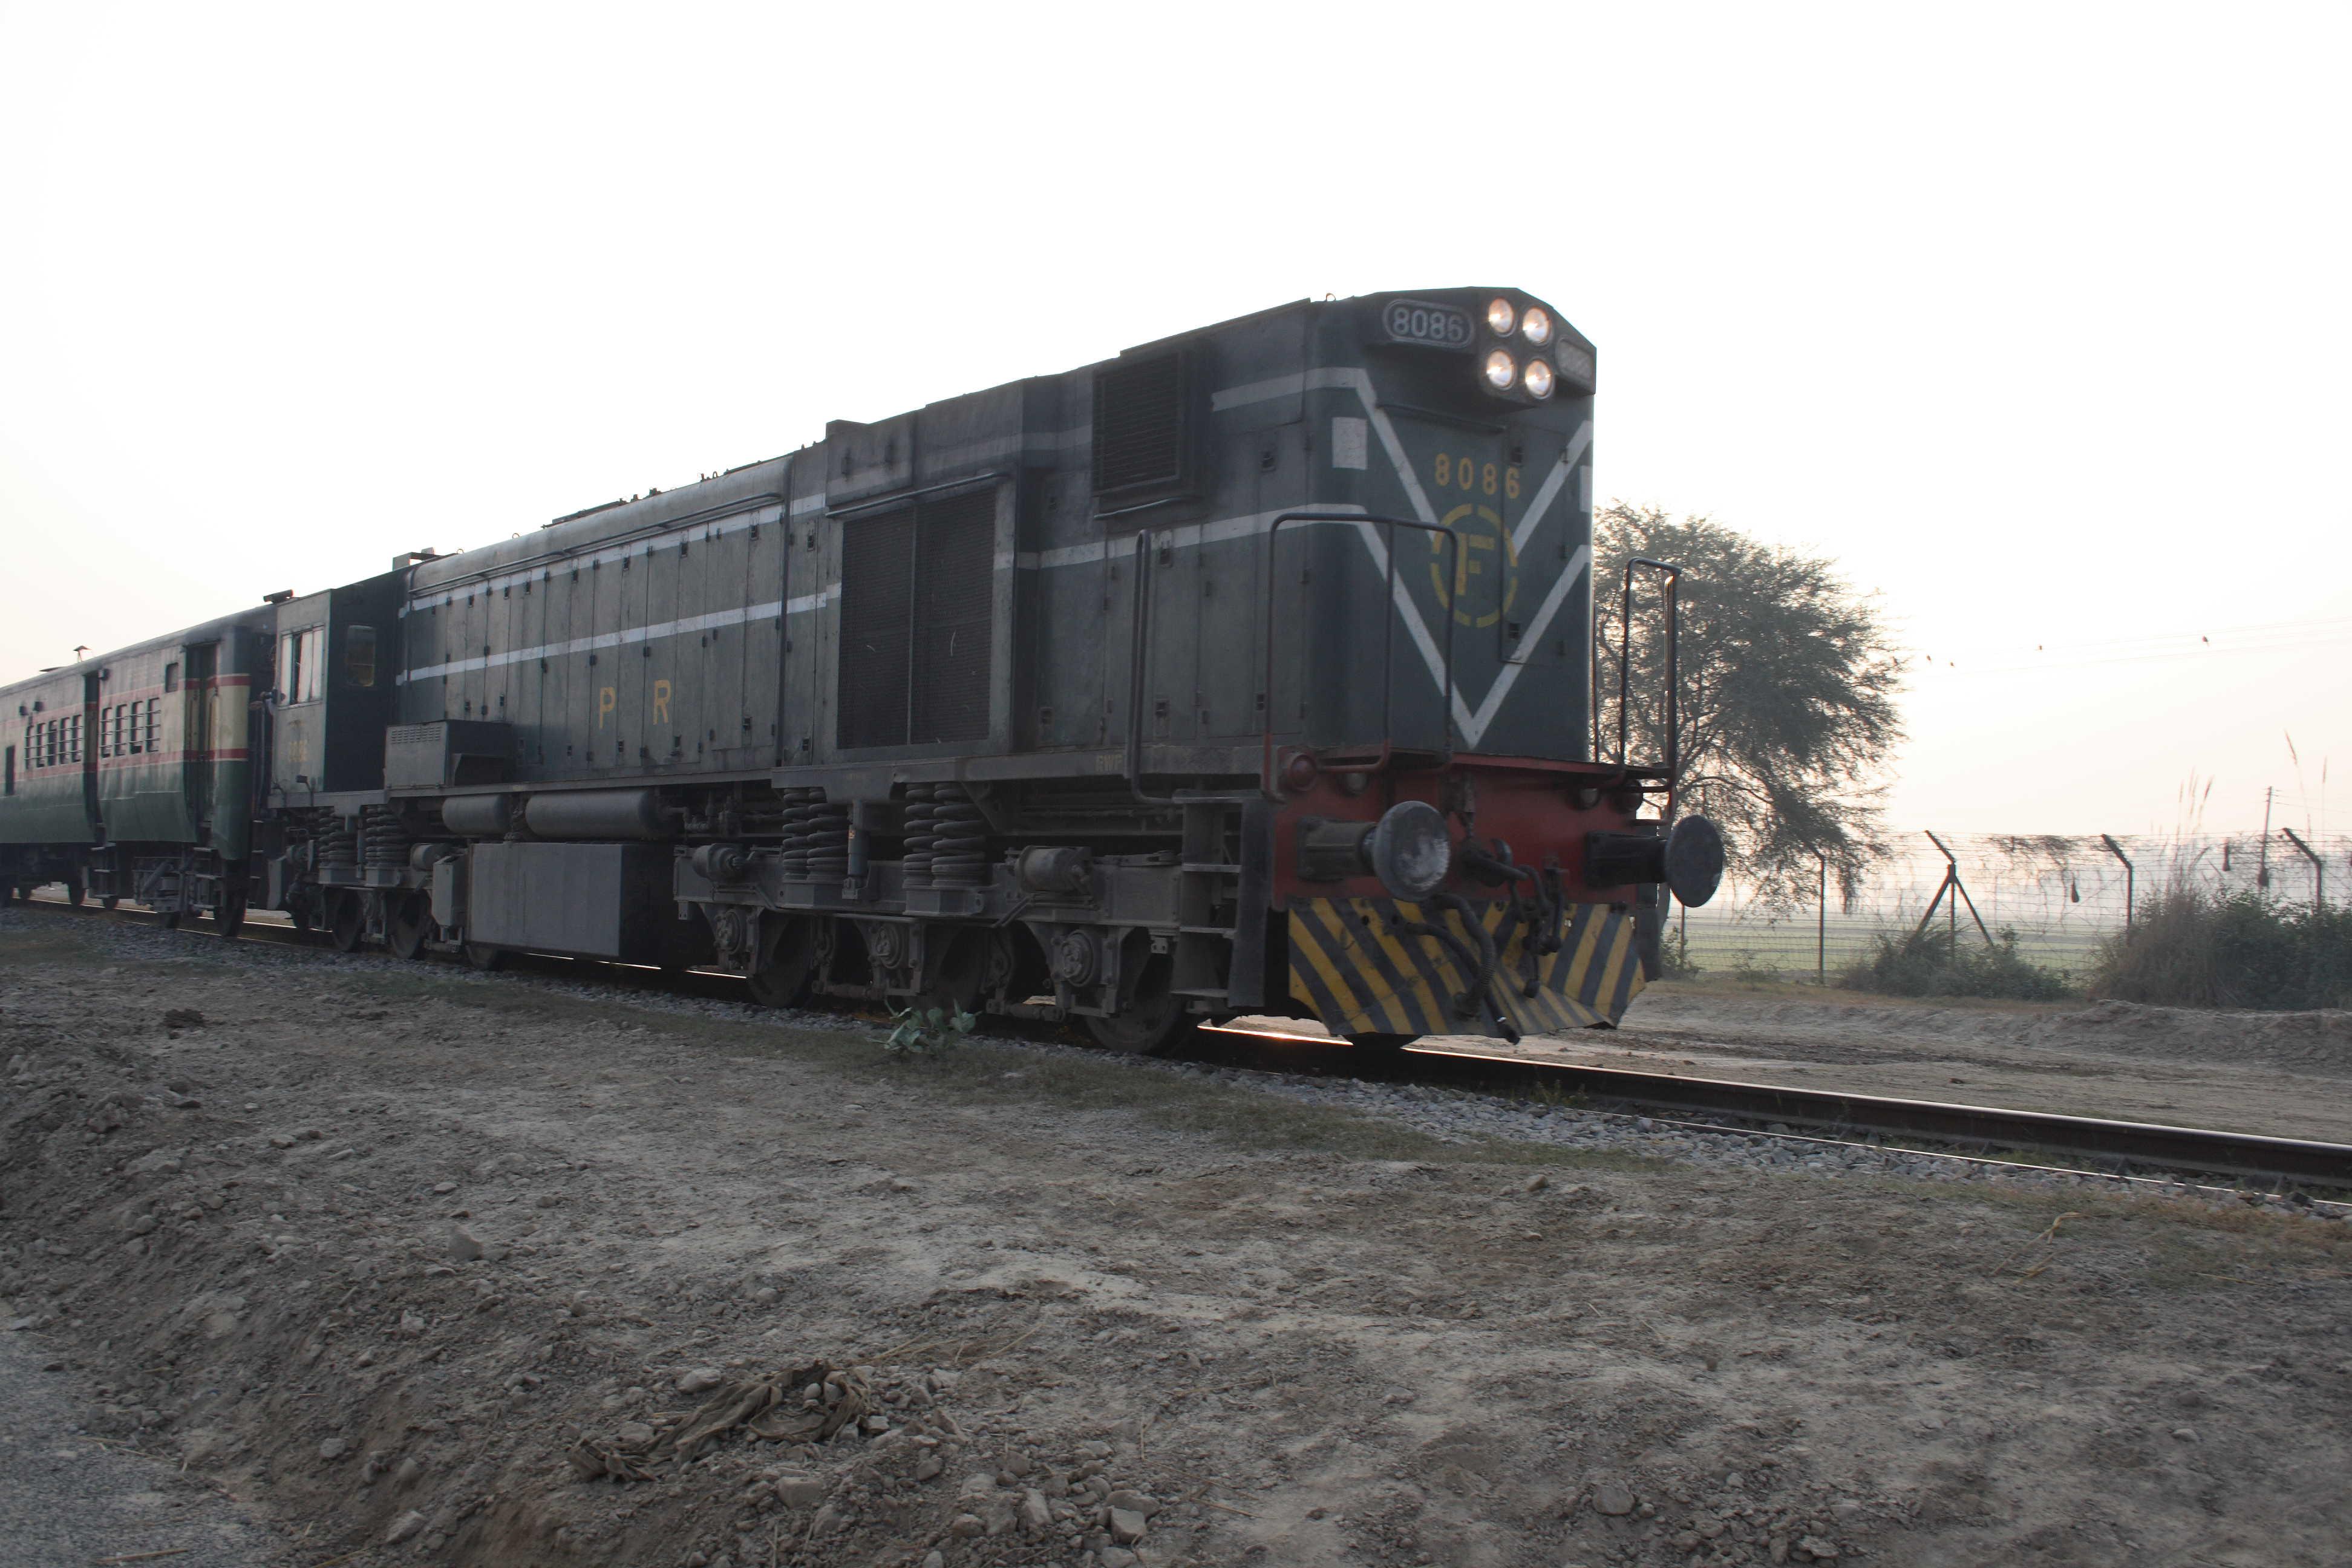 india to pakistan train route map Samjhauta Express Wikipedia india to pakistan train route map